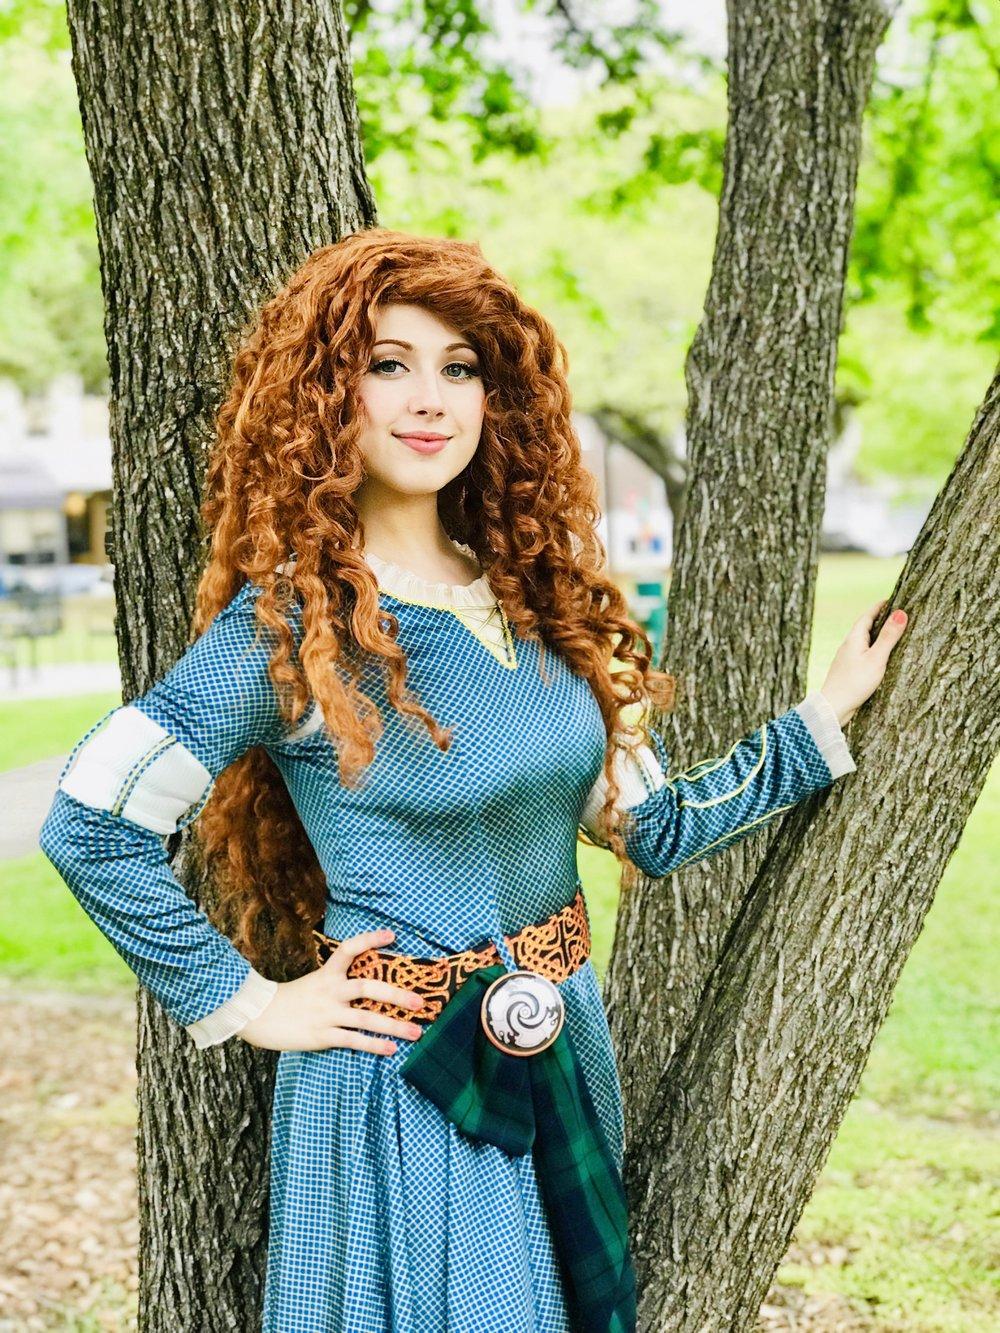 Brave Princess  Entertainment